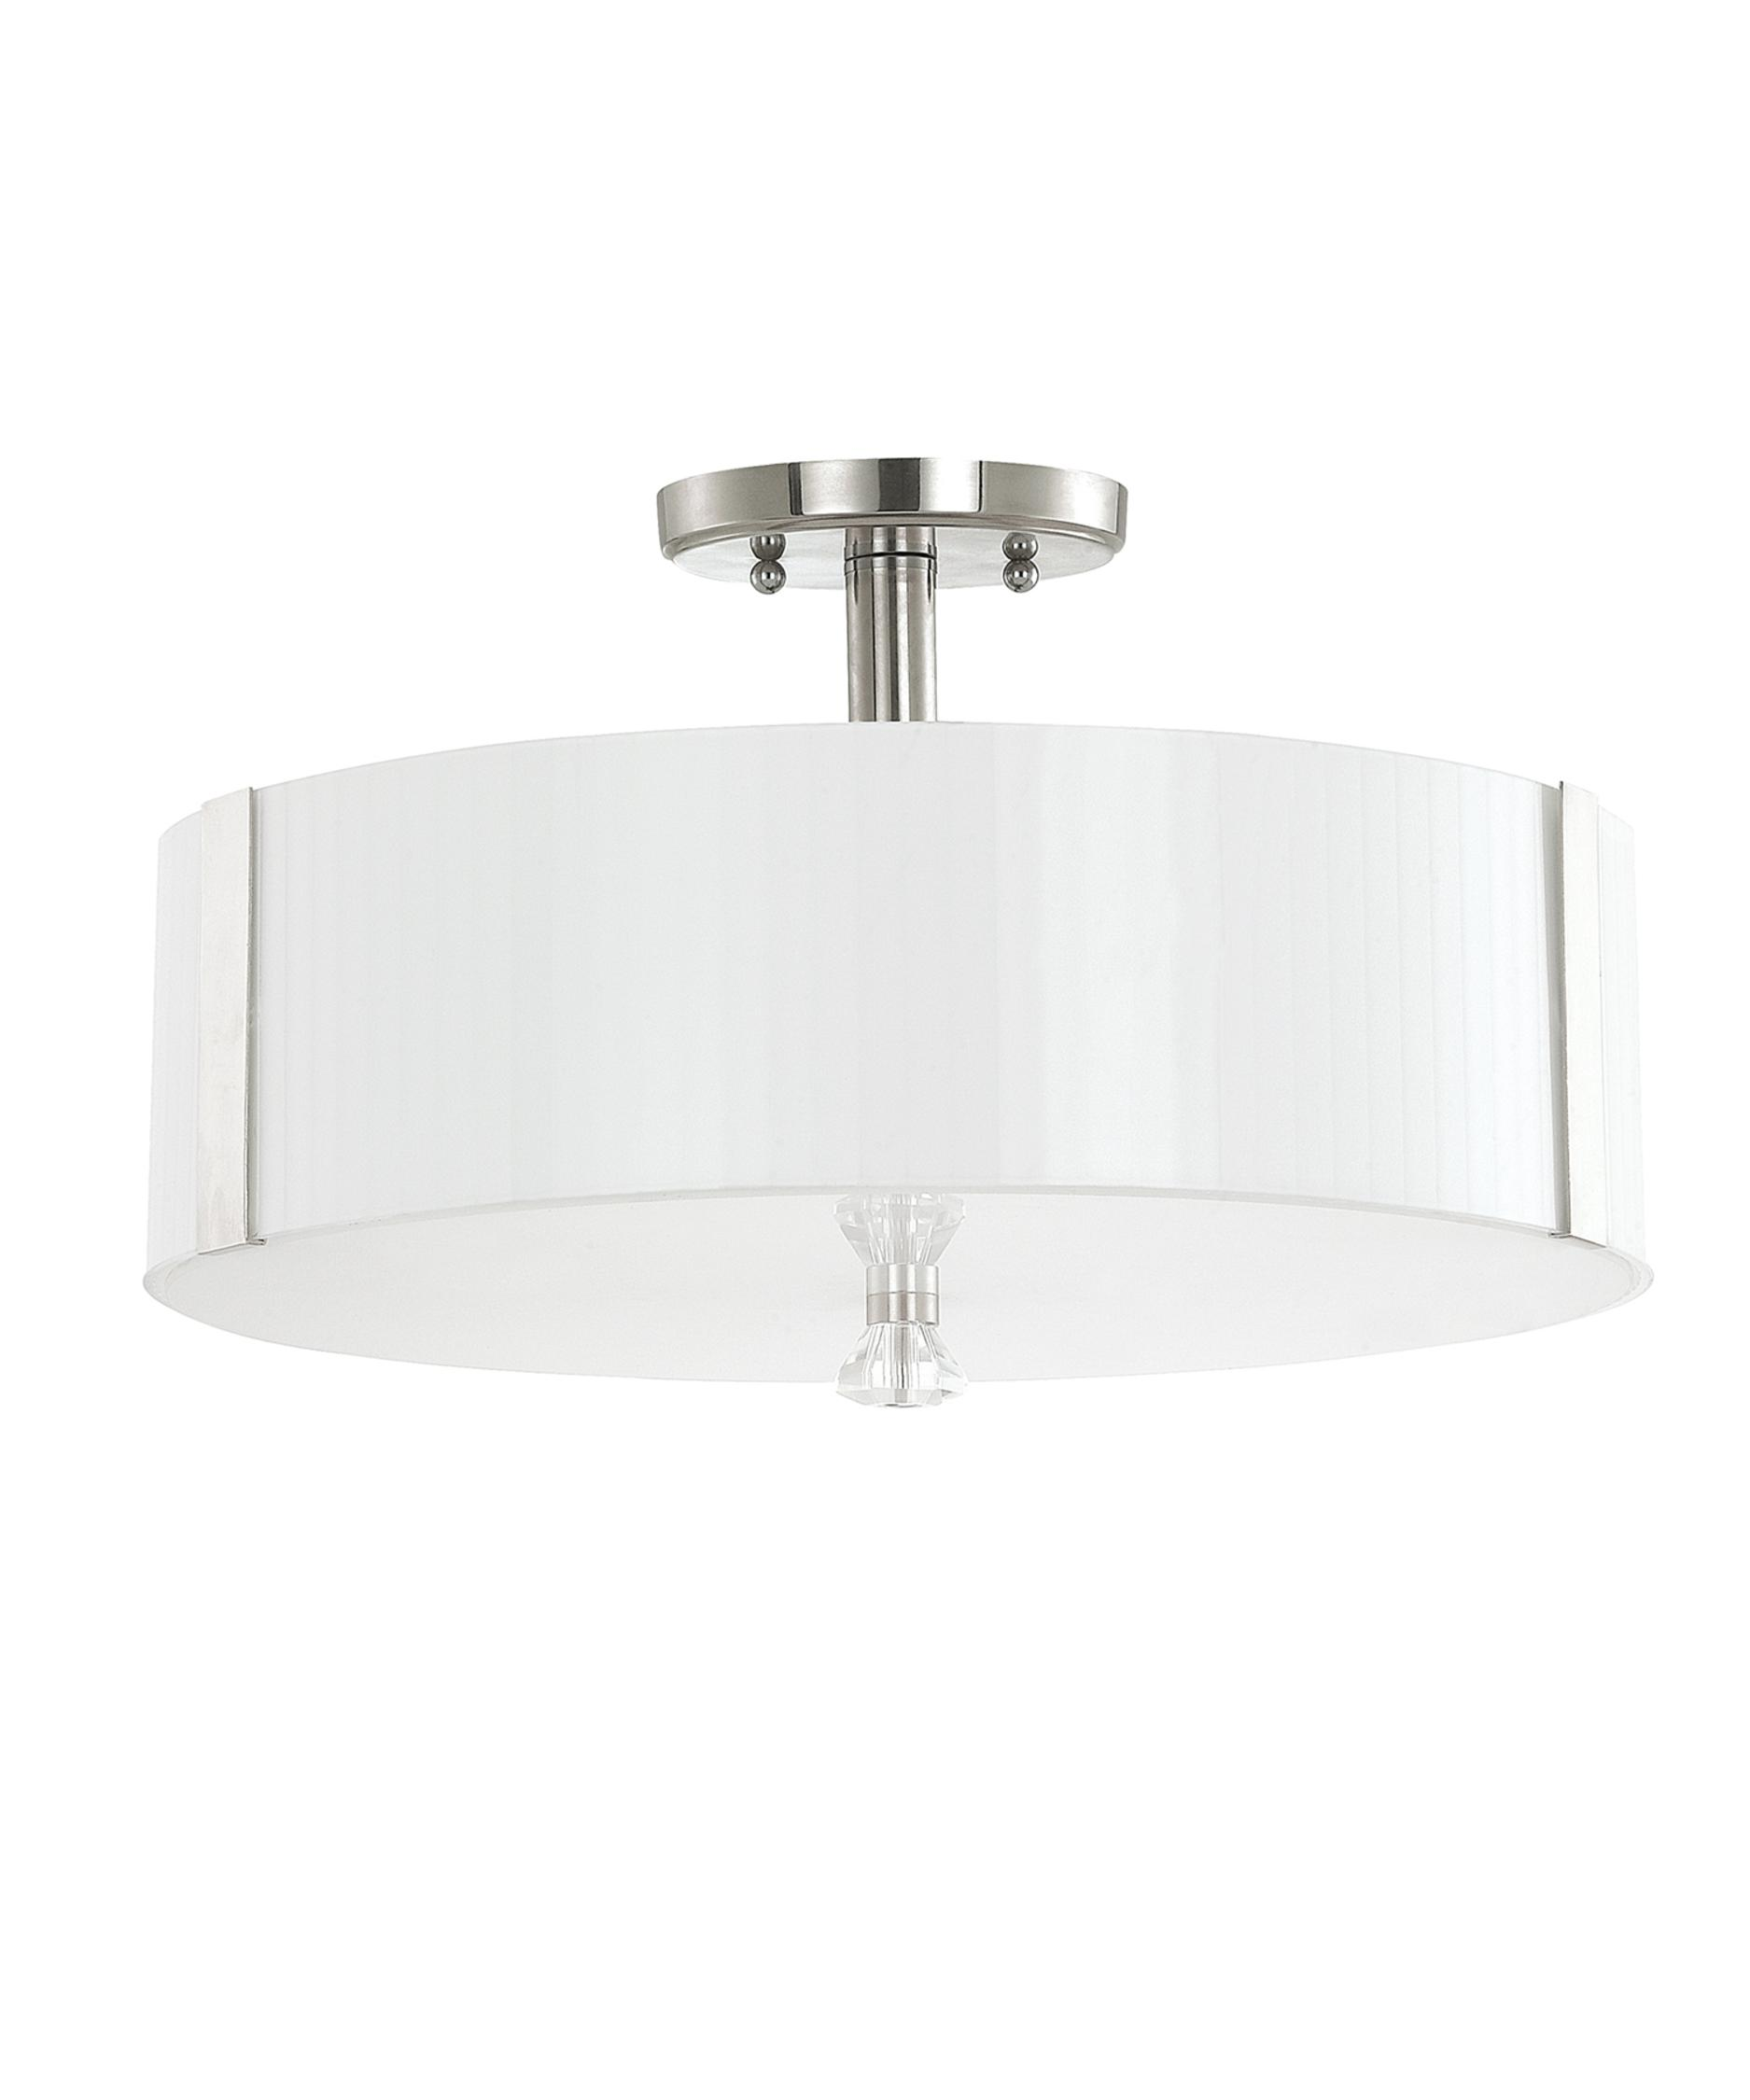 capital lighting alisa 16 inch wide semi flush mount capitol lighting - Capital Lighting